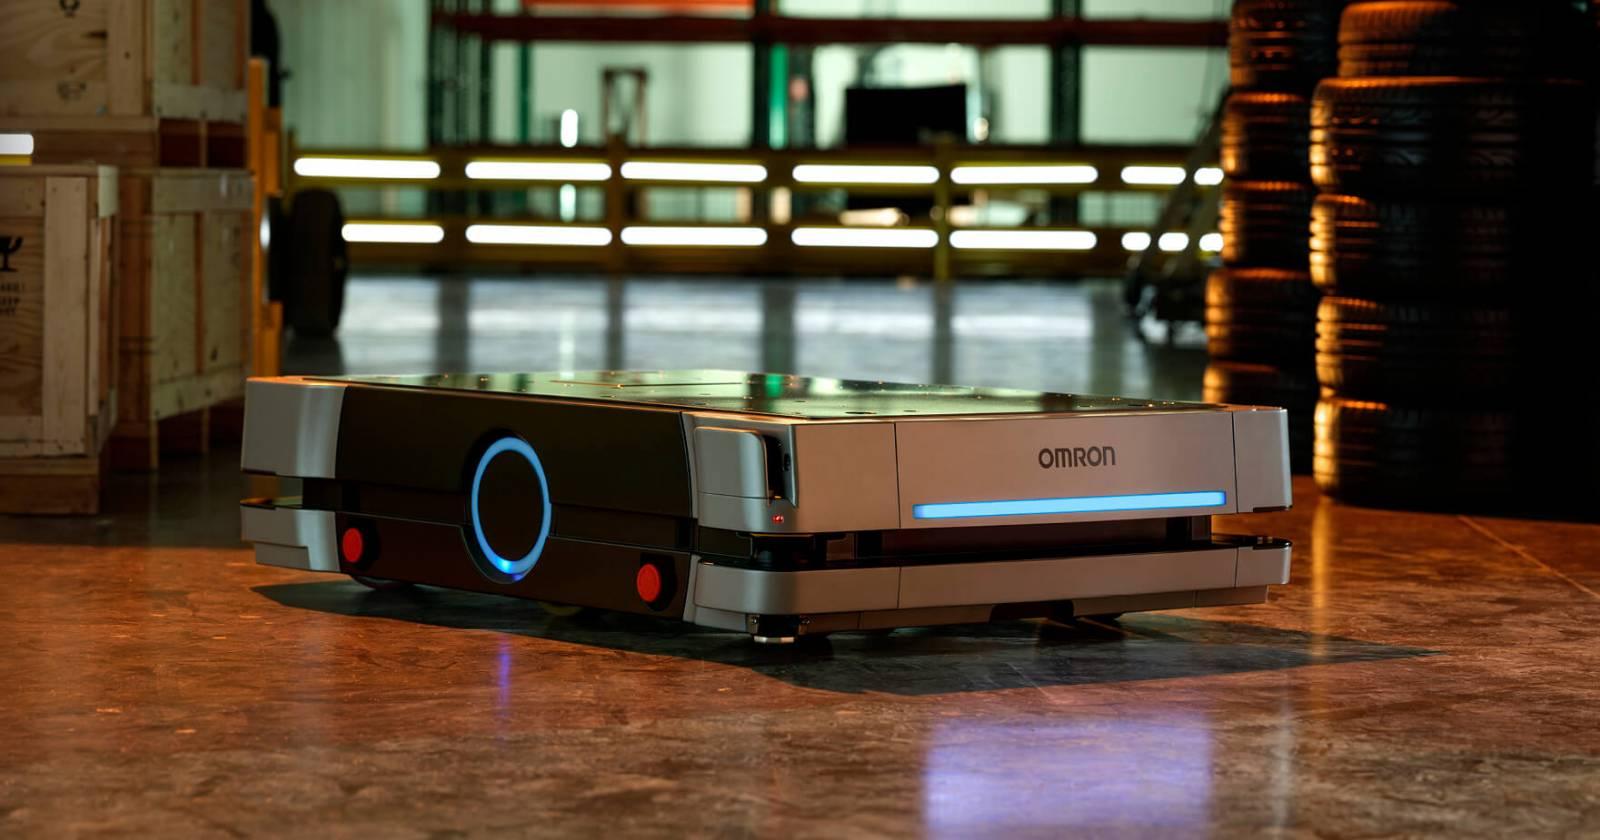 ", <span class=""caps"">OMRON</span> klar med ny mobil robot, Gibotech"